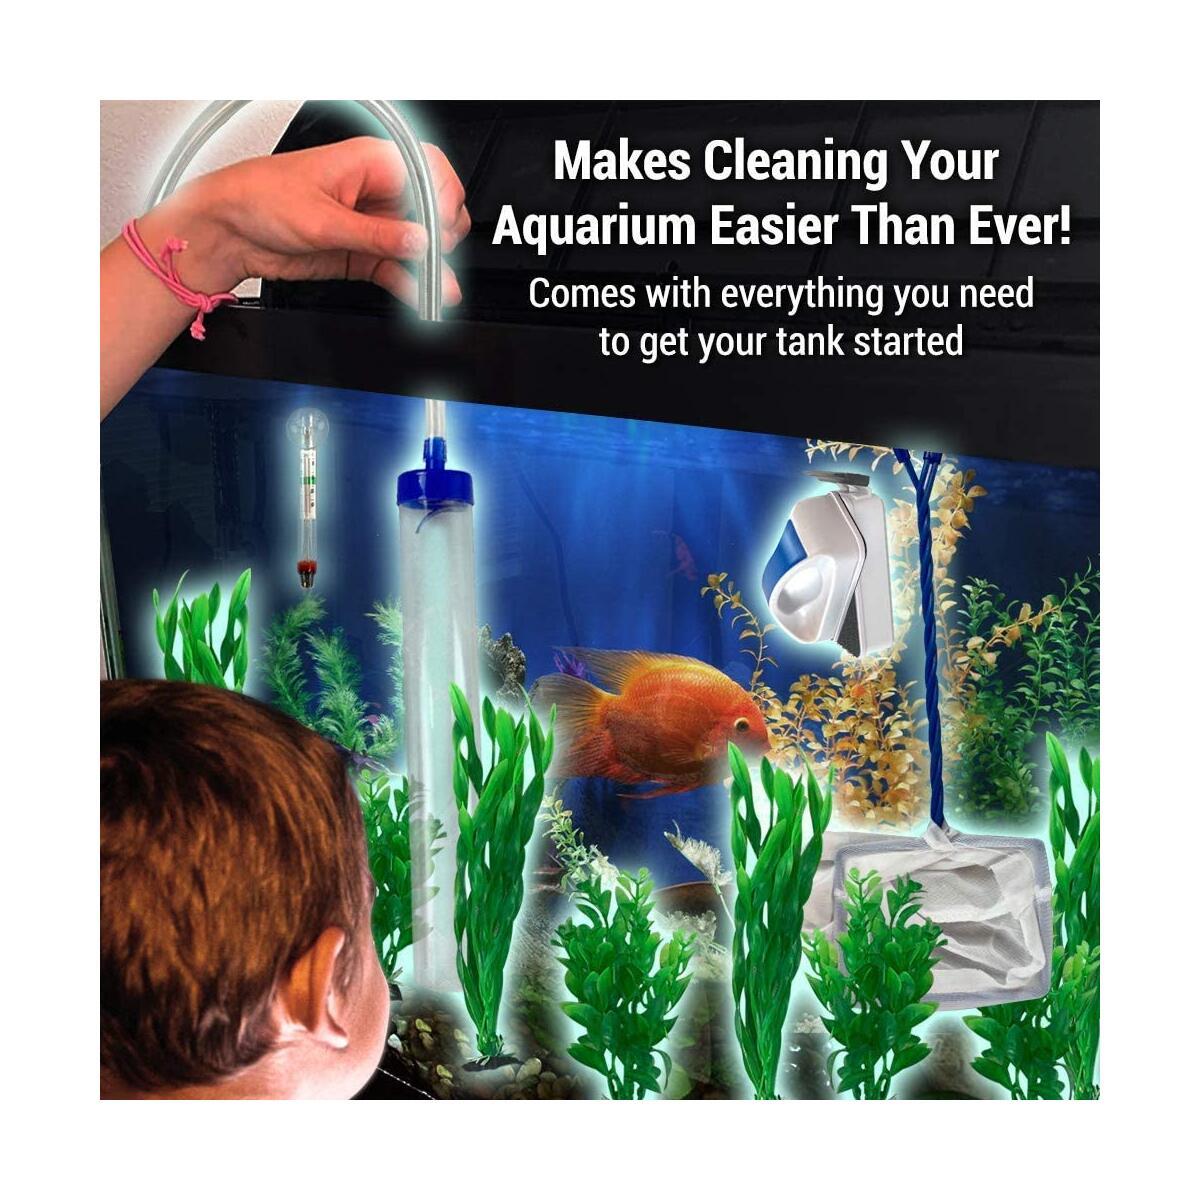 Friendly Fish Co. 12-in-1 Fish Tank/Aquarium Cleaner Starter Kit w/Siphon, Fish Net, Magnet Brush, Algae Scraper, Fish Tank Thermometer & Aquarium Plants - BPA Free Aquarium Cleaning Tools